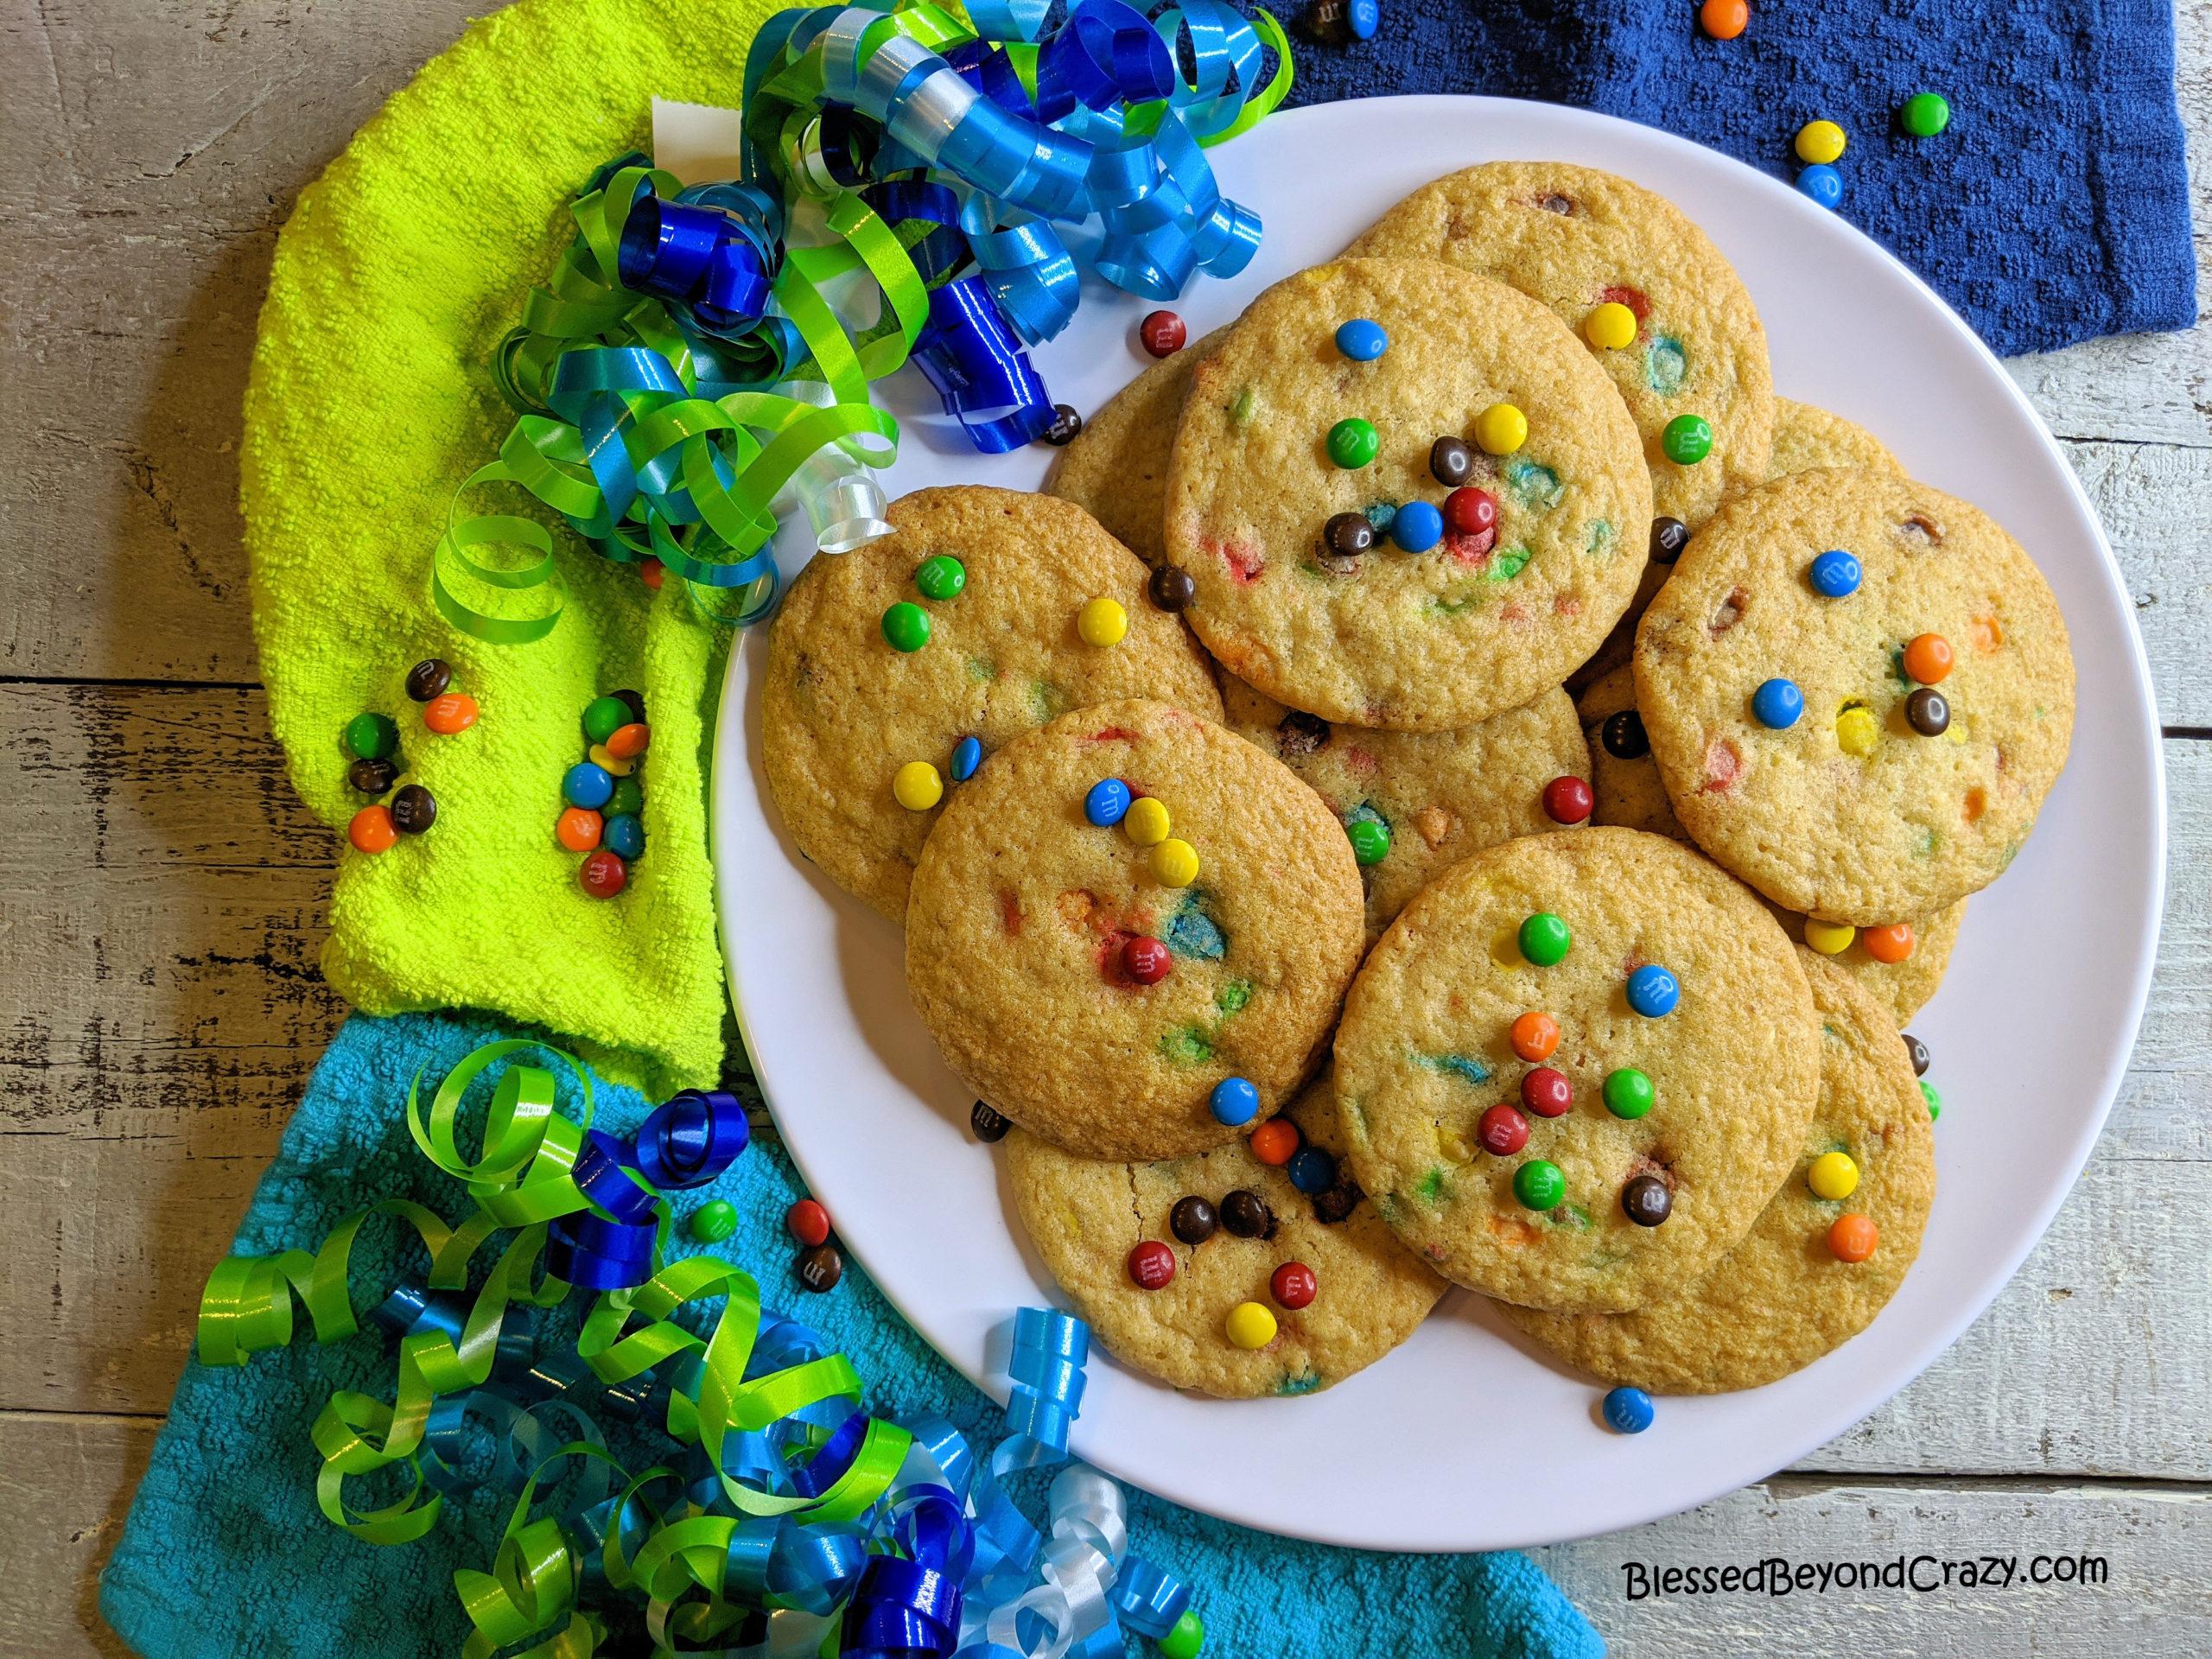 Festive plate of Kid's Favorite Gluten-Free Jumbo Cookies